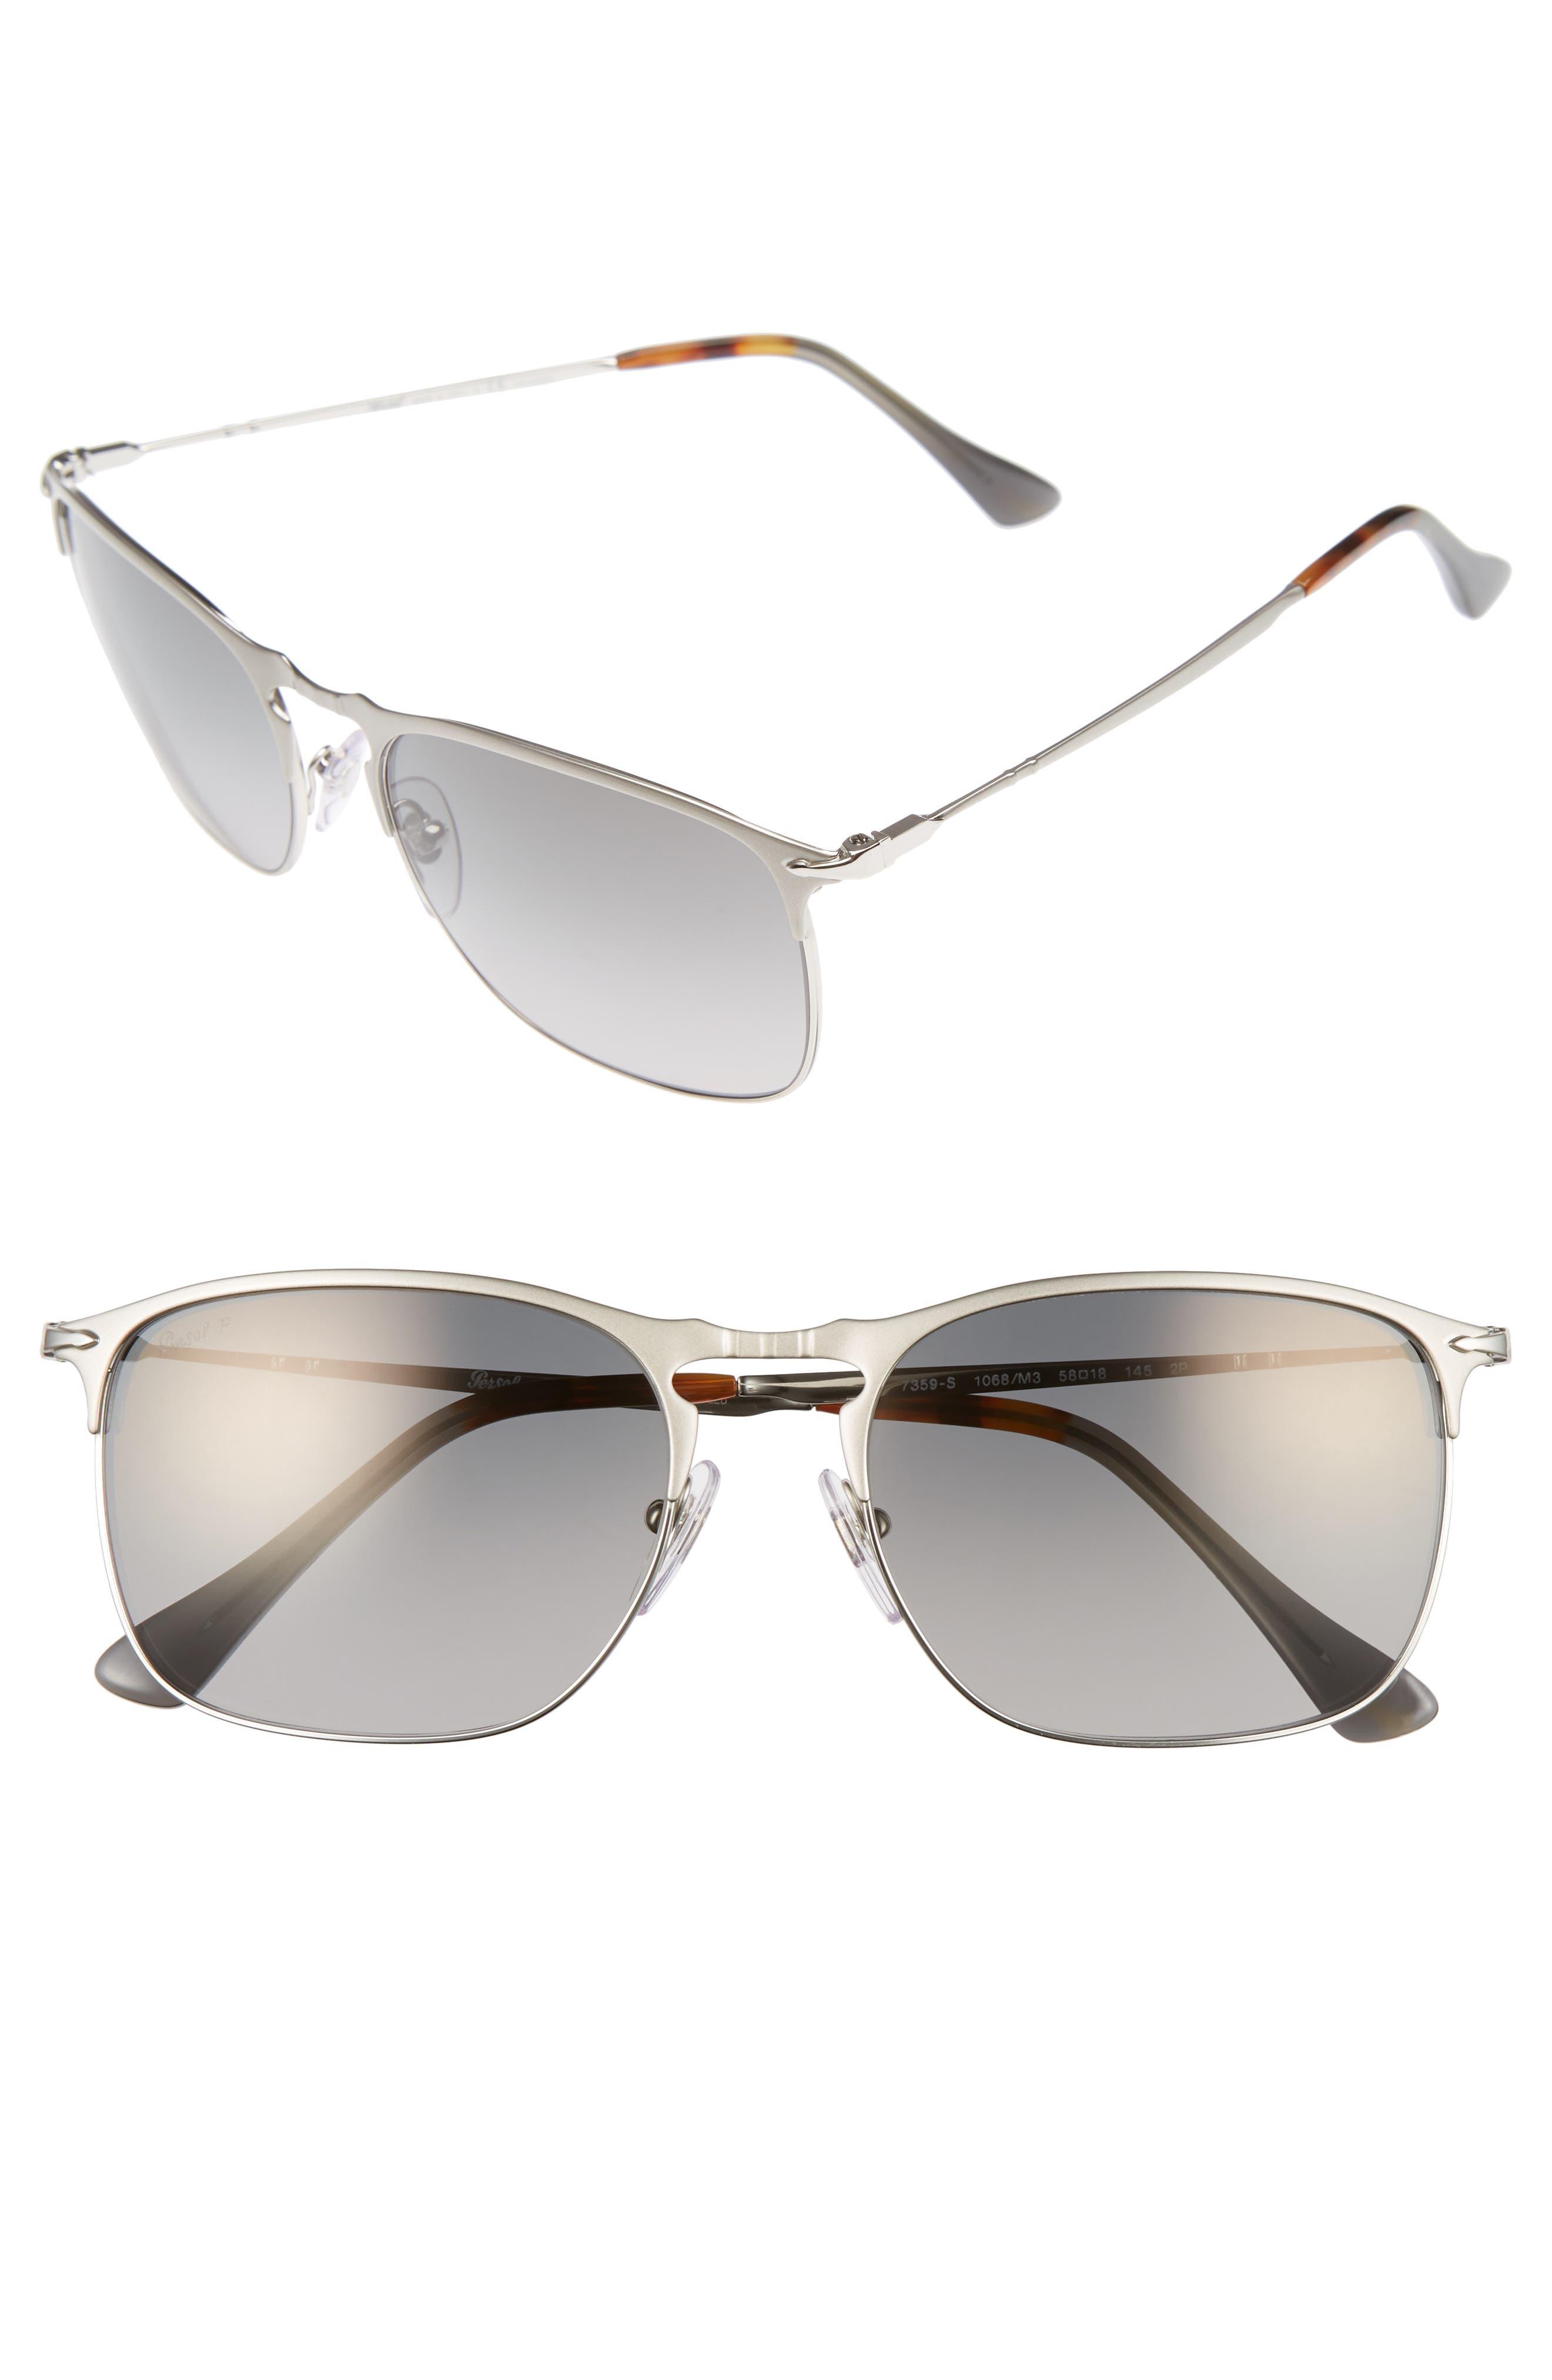 Evolution 58mm Polarized Aviator Sunglasses,                         Main,                         color,